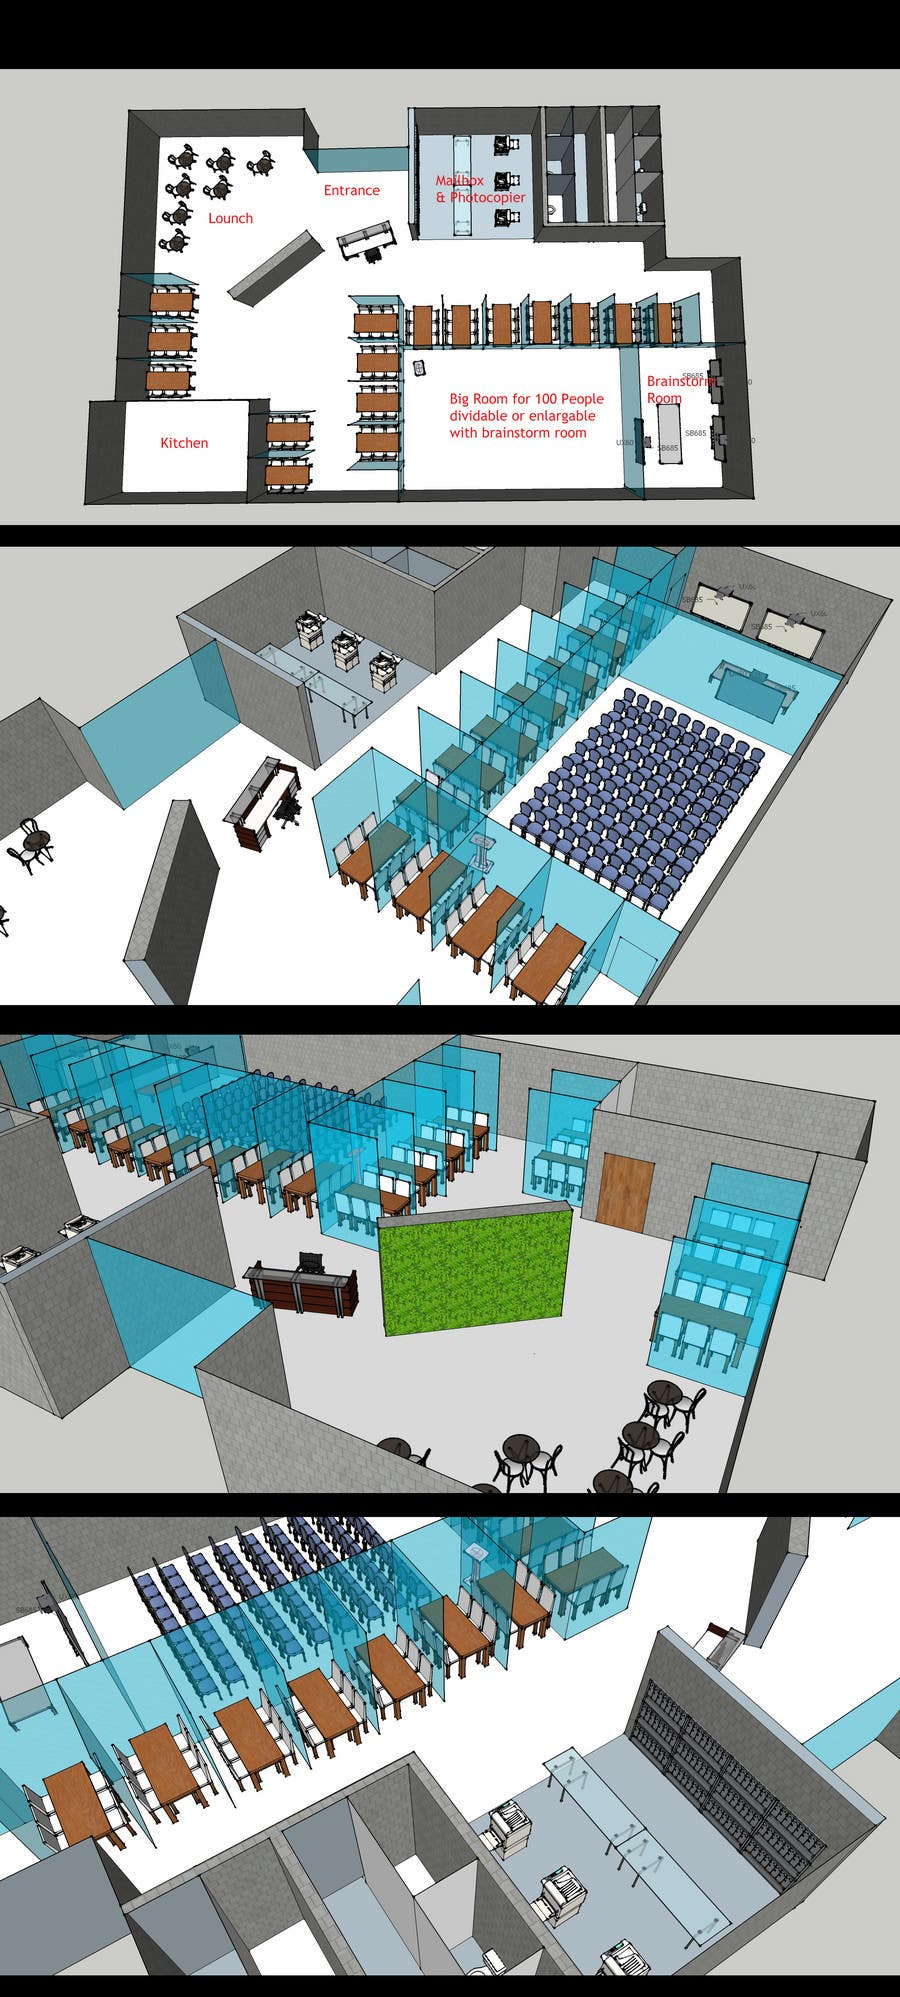 Bài tham dự cuộc thi #                                        18                                      cho                                         Architectural Floorplan Layout for PolarPointe Business Cafe